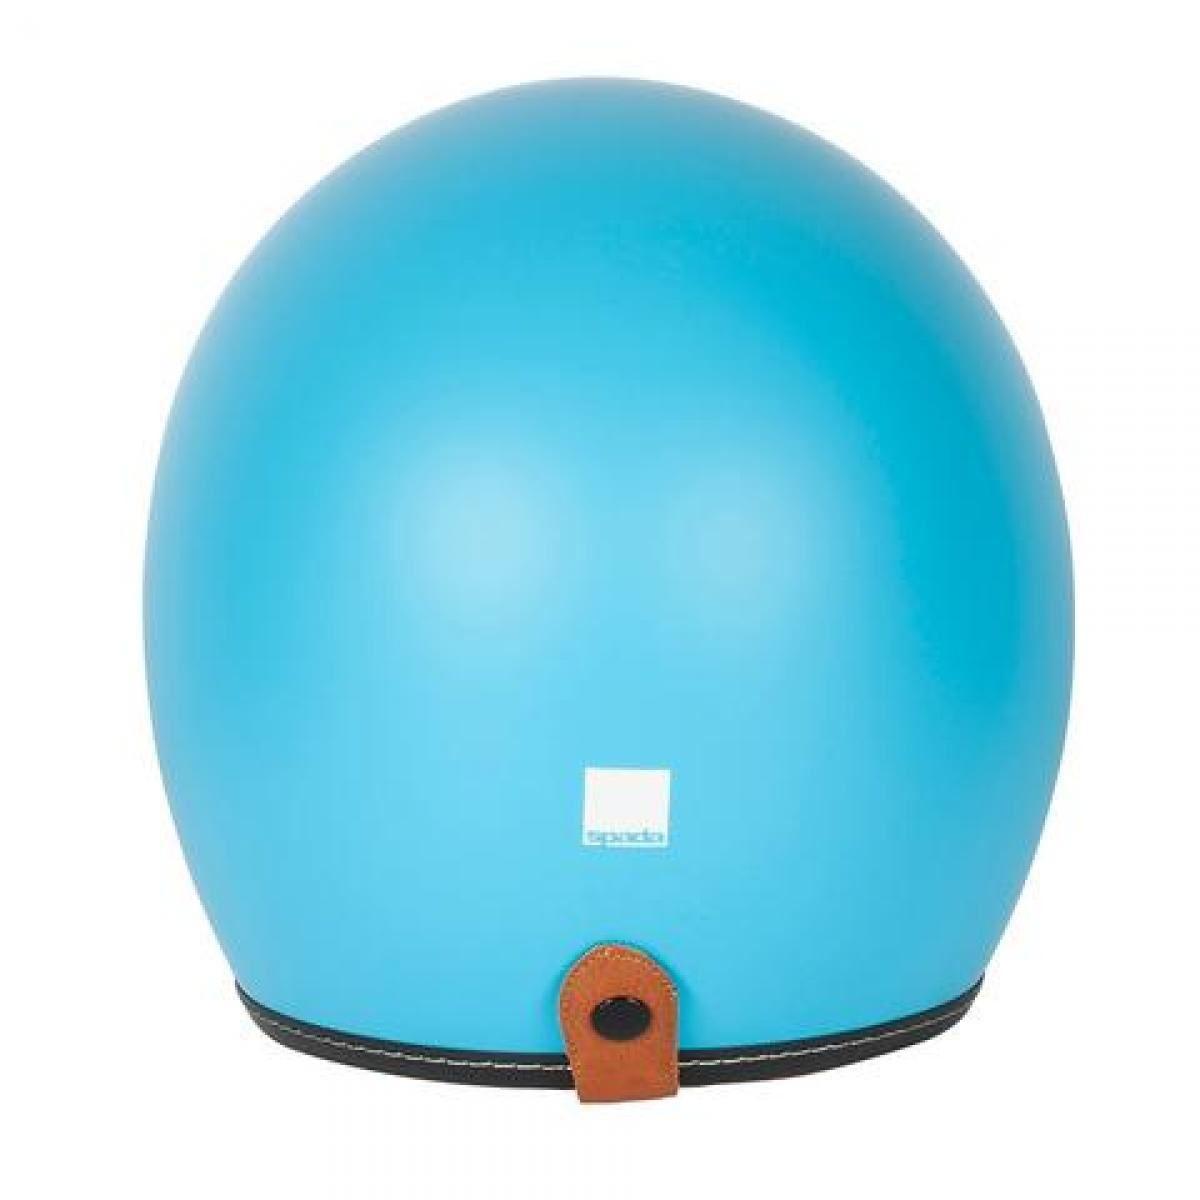 Spada-Raze-Ouvert-Casque-Bleu-Integre-Visiere miniature 10